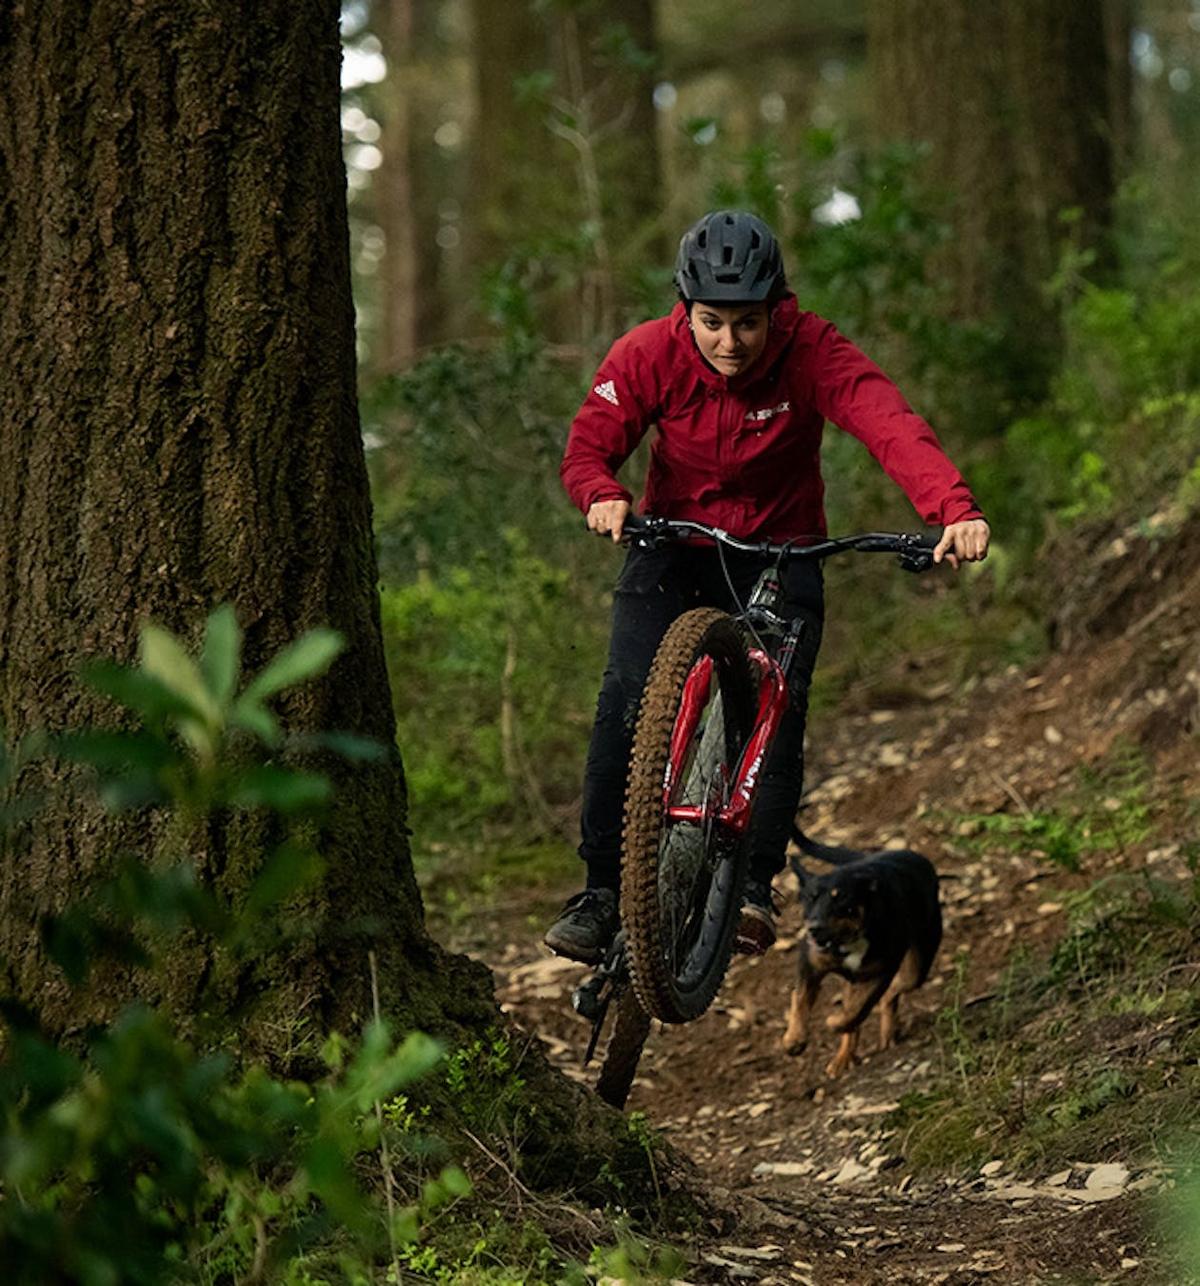 Vero riding the Santa Cruz Bronson with her dog